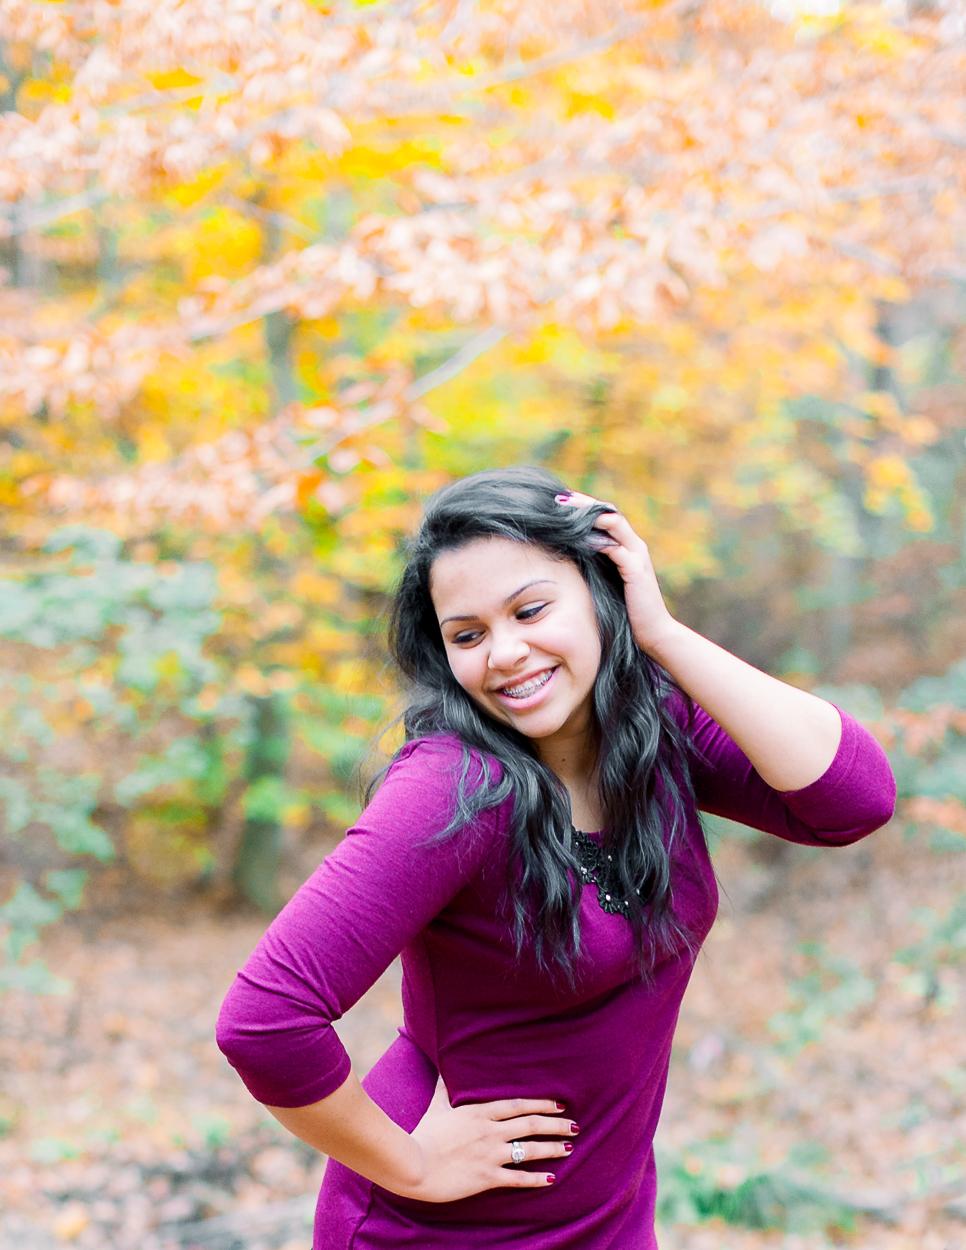 seniorphotos_fall_fredericksburgphotographer_virginia_youseephotography_ashley (15).JPG